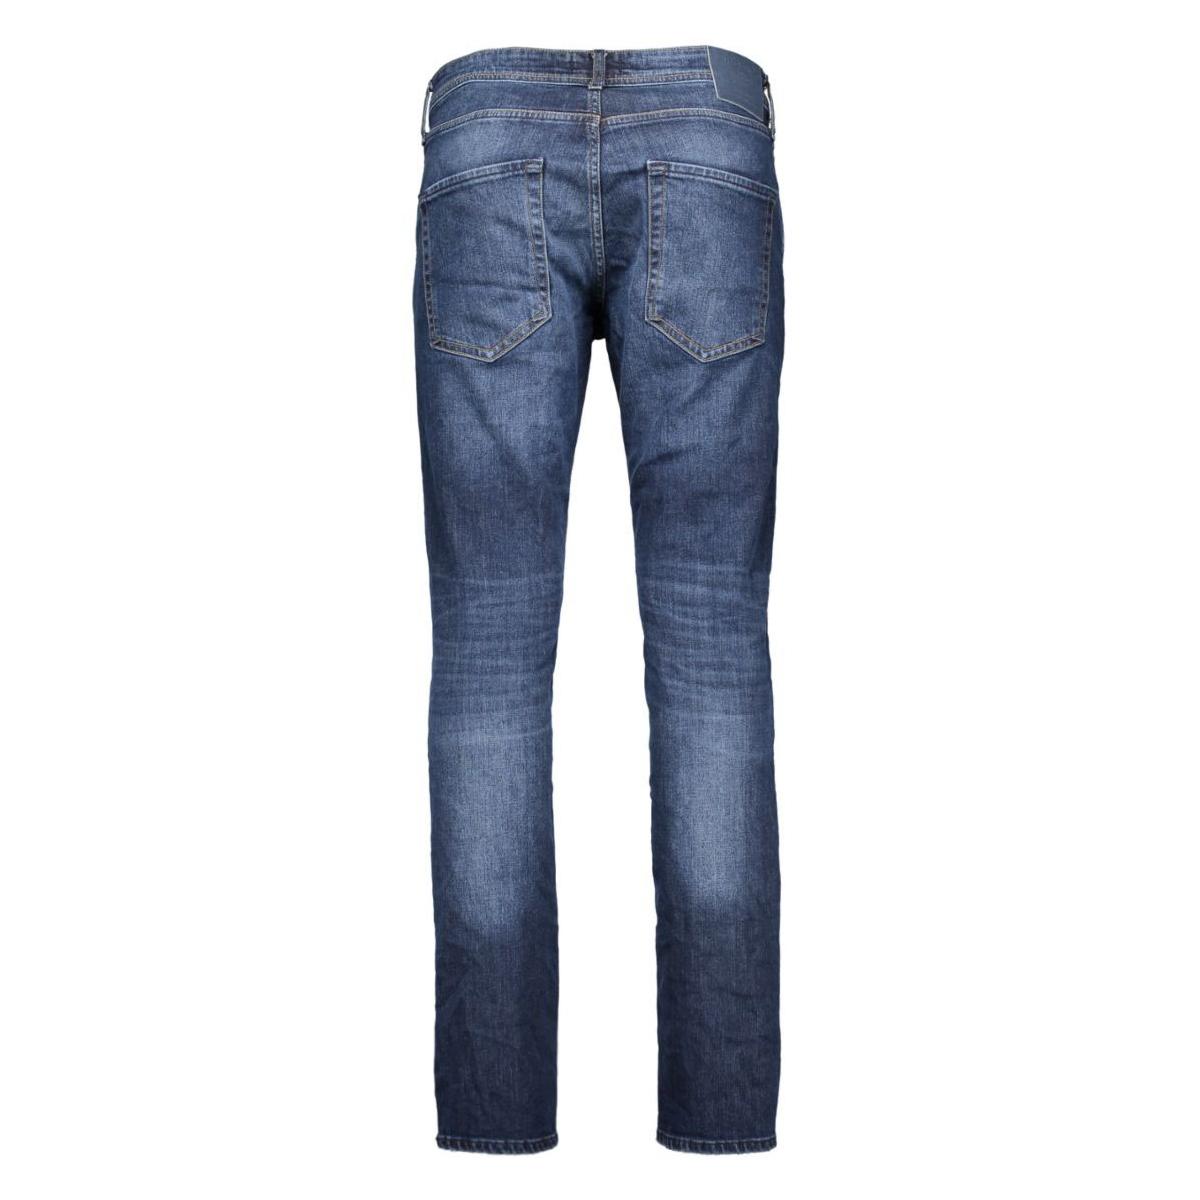 jjitim jjoriginal am 085 12115779 jack & jones jeans blue denim